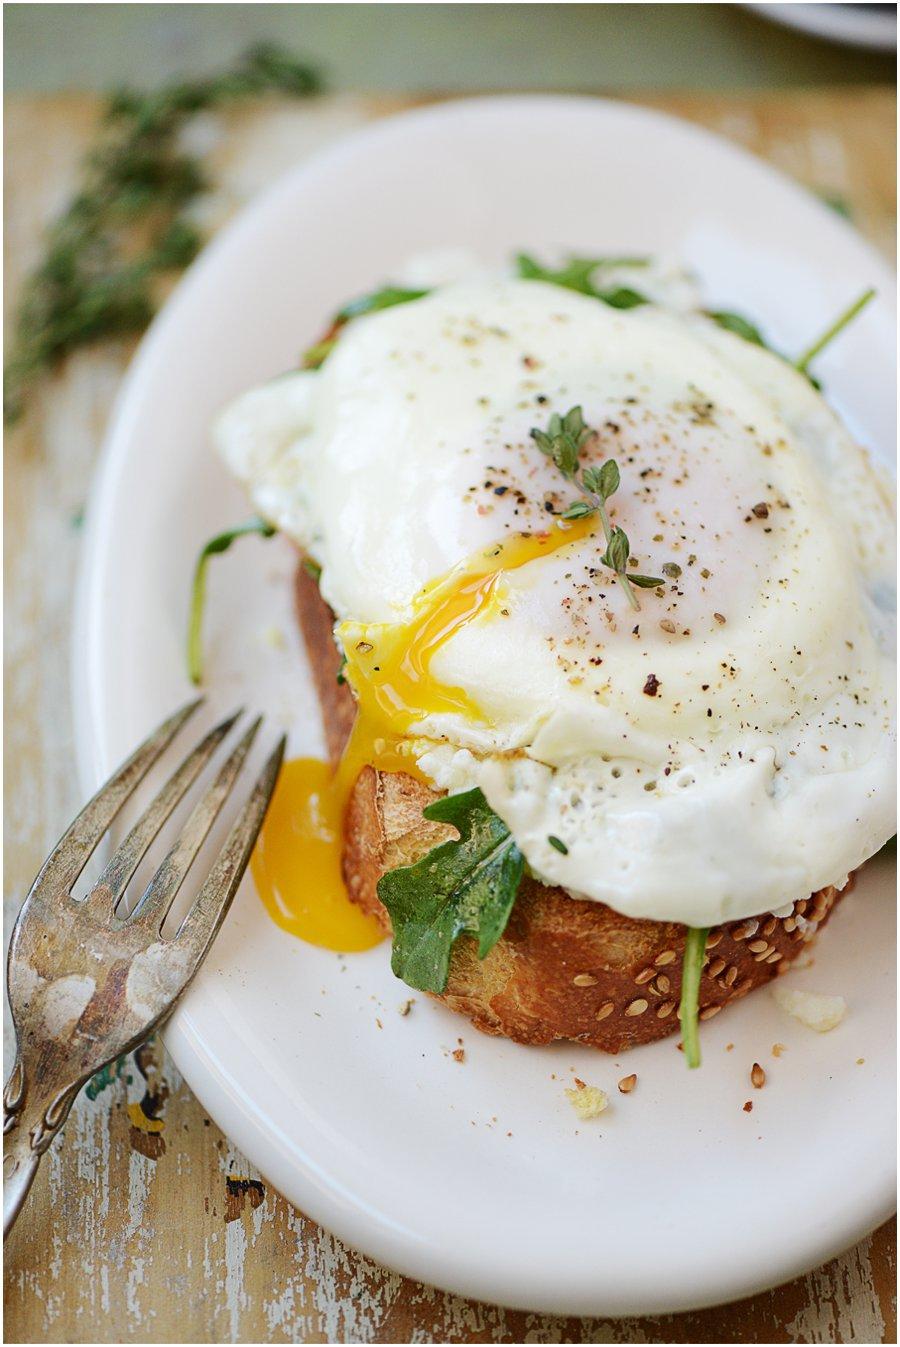 Egg on a toast with ricotta & arugula.